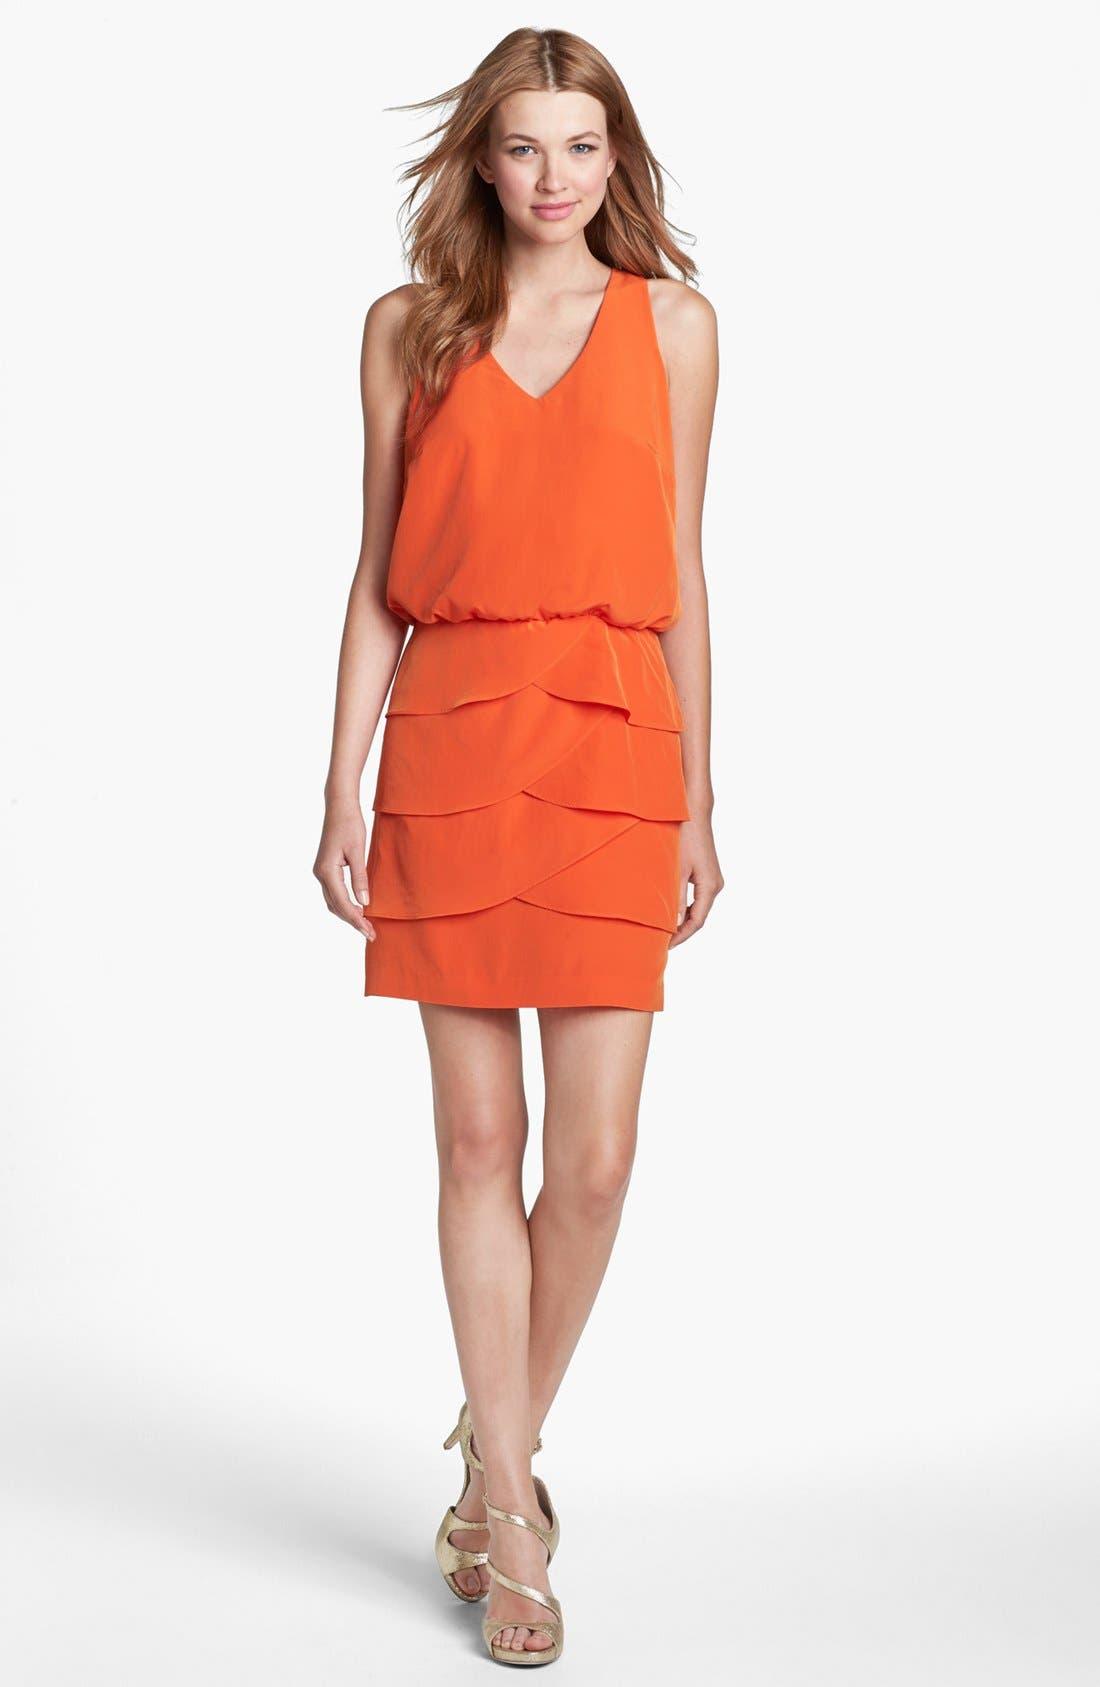 Alternate Image 1 Selected - Laundry by Shelli Segal Tiered Skirt Racerback Blouson Dress